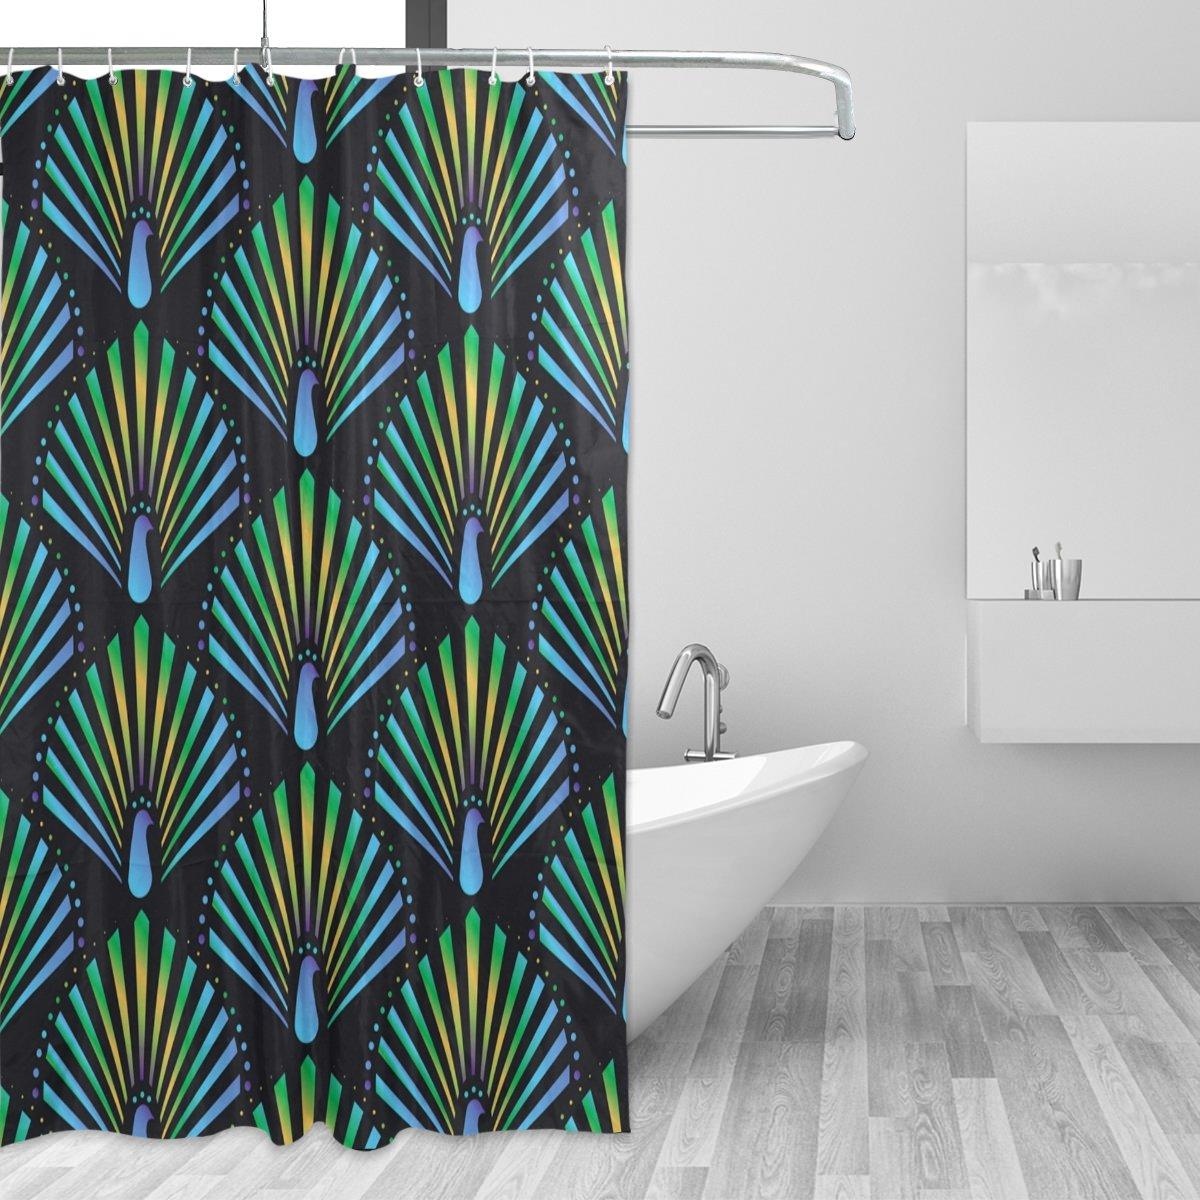 Bathroom Shower Curtain Peacock Print Waterproof Mildew Bath Curtains 12 Hooks